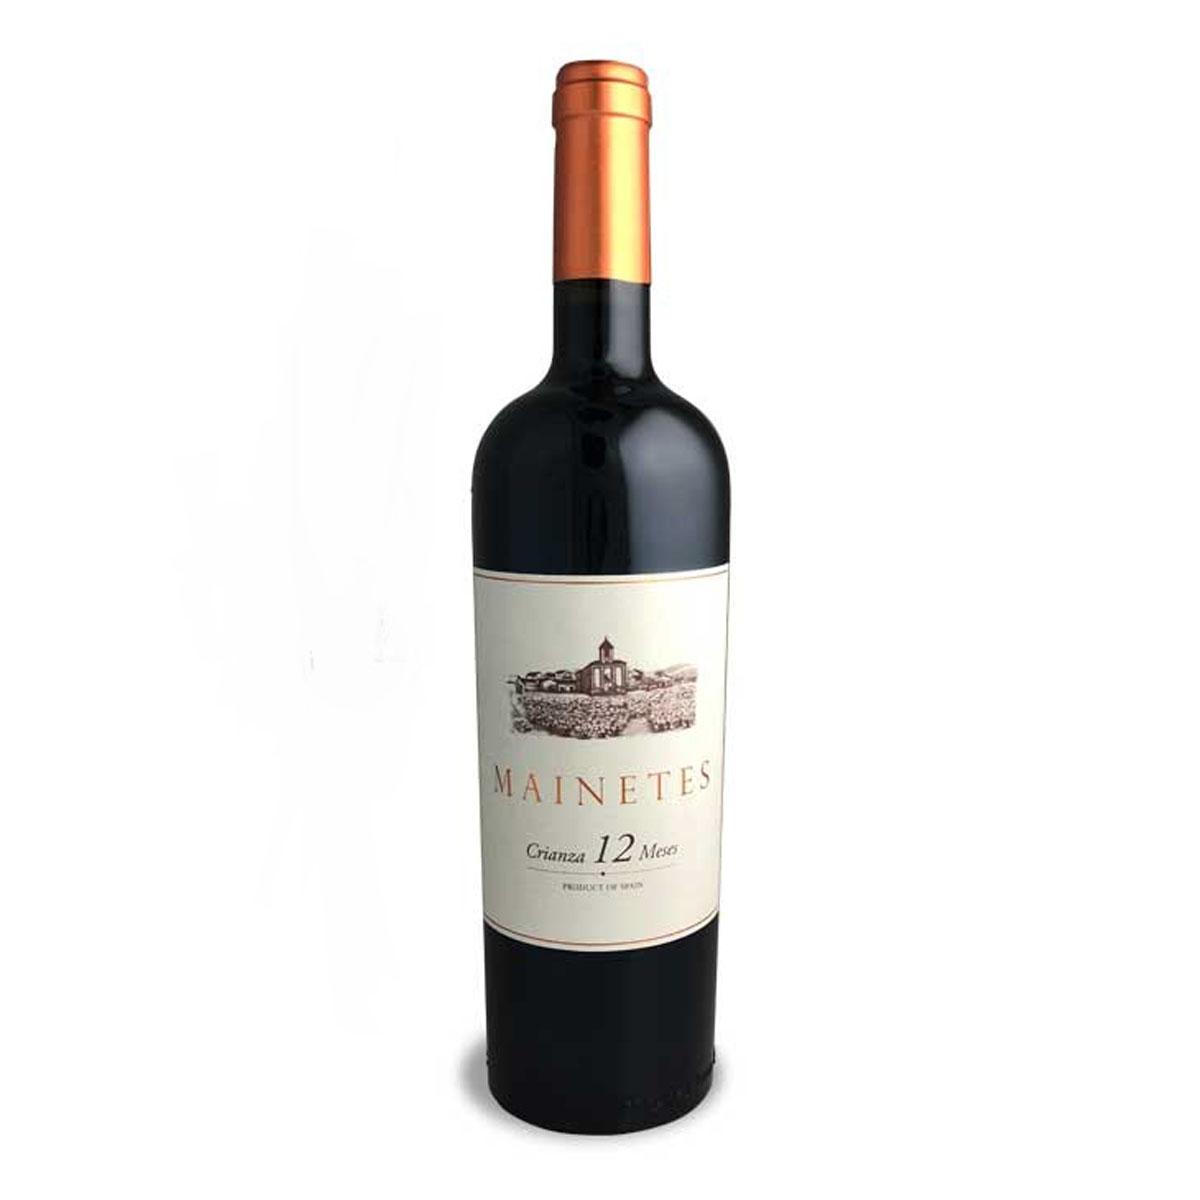 西班牙MAINETES CRIANZA 12 干红葡萄酒